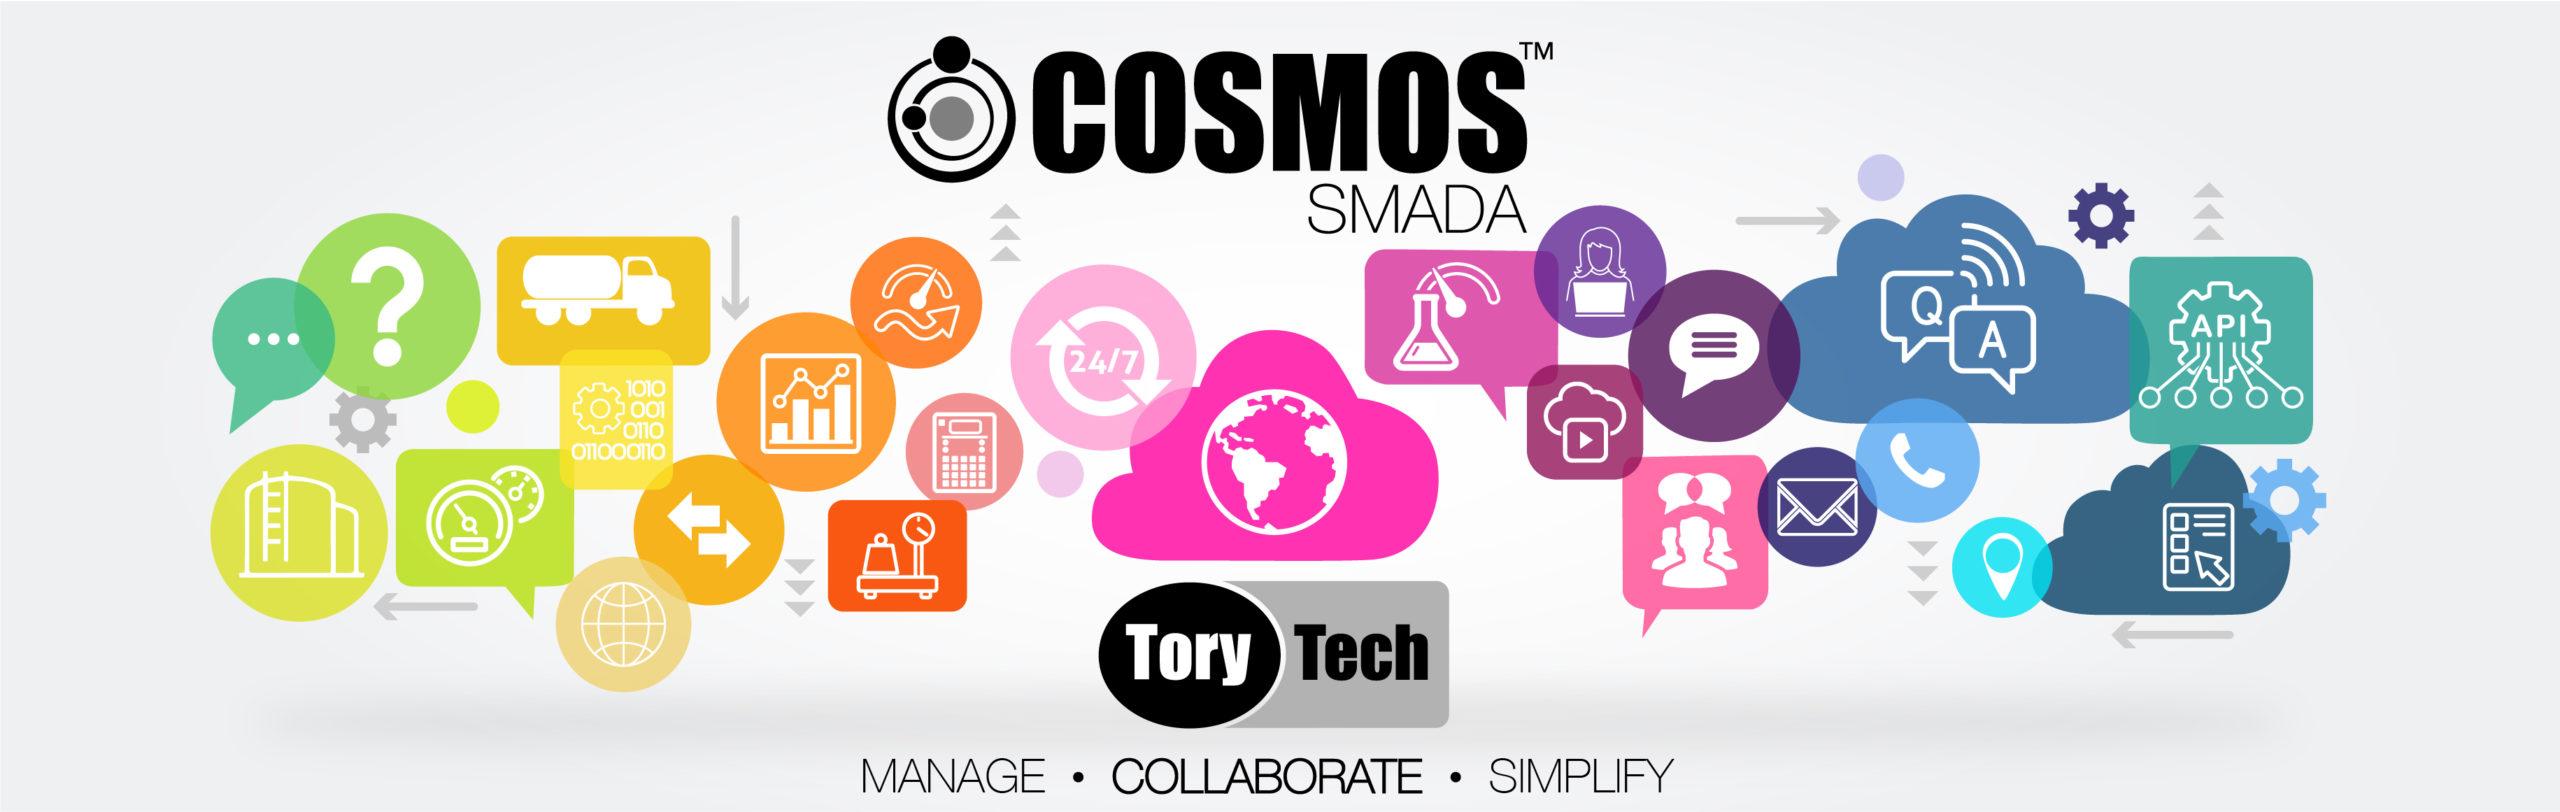 COSMOS capabilities